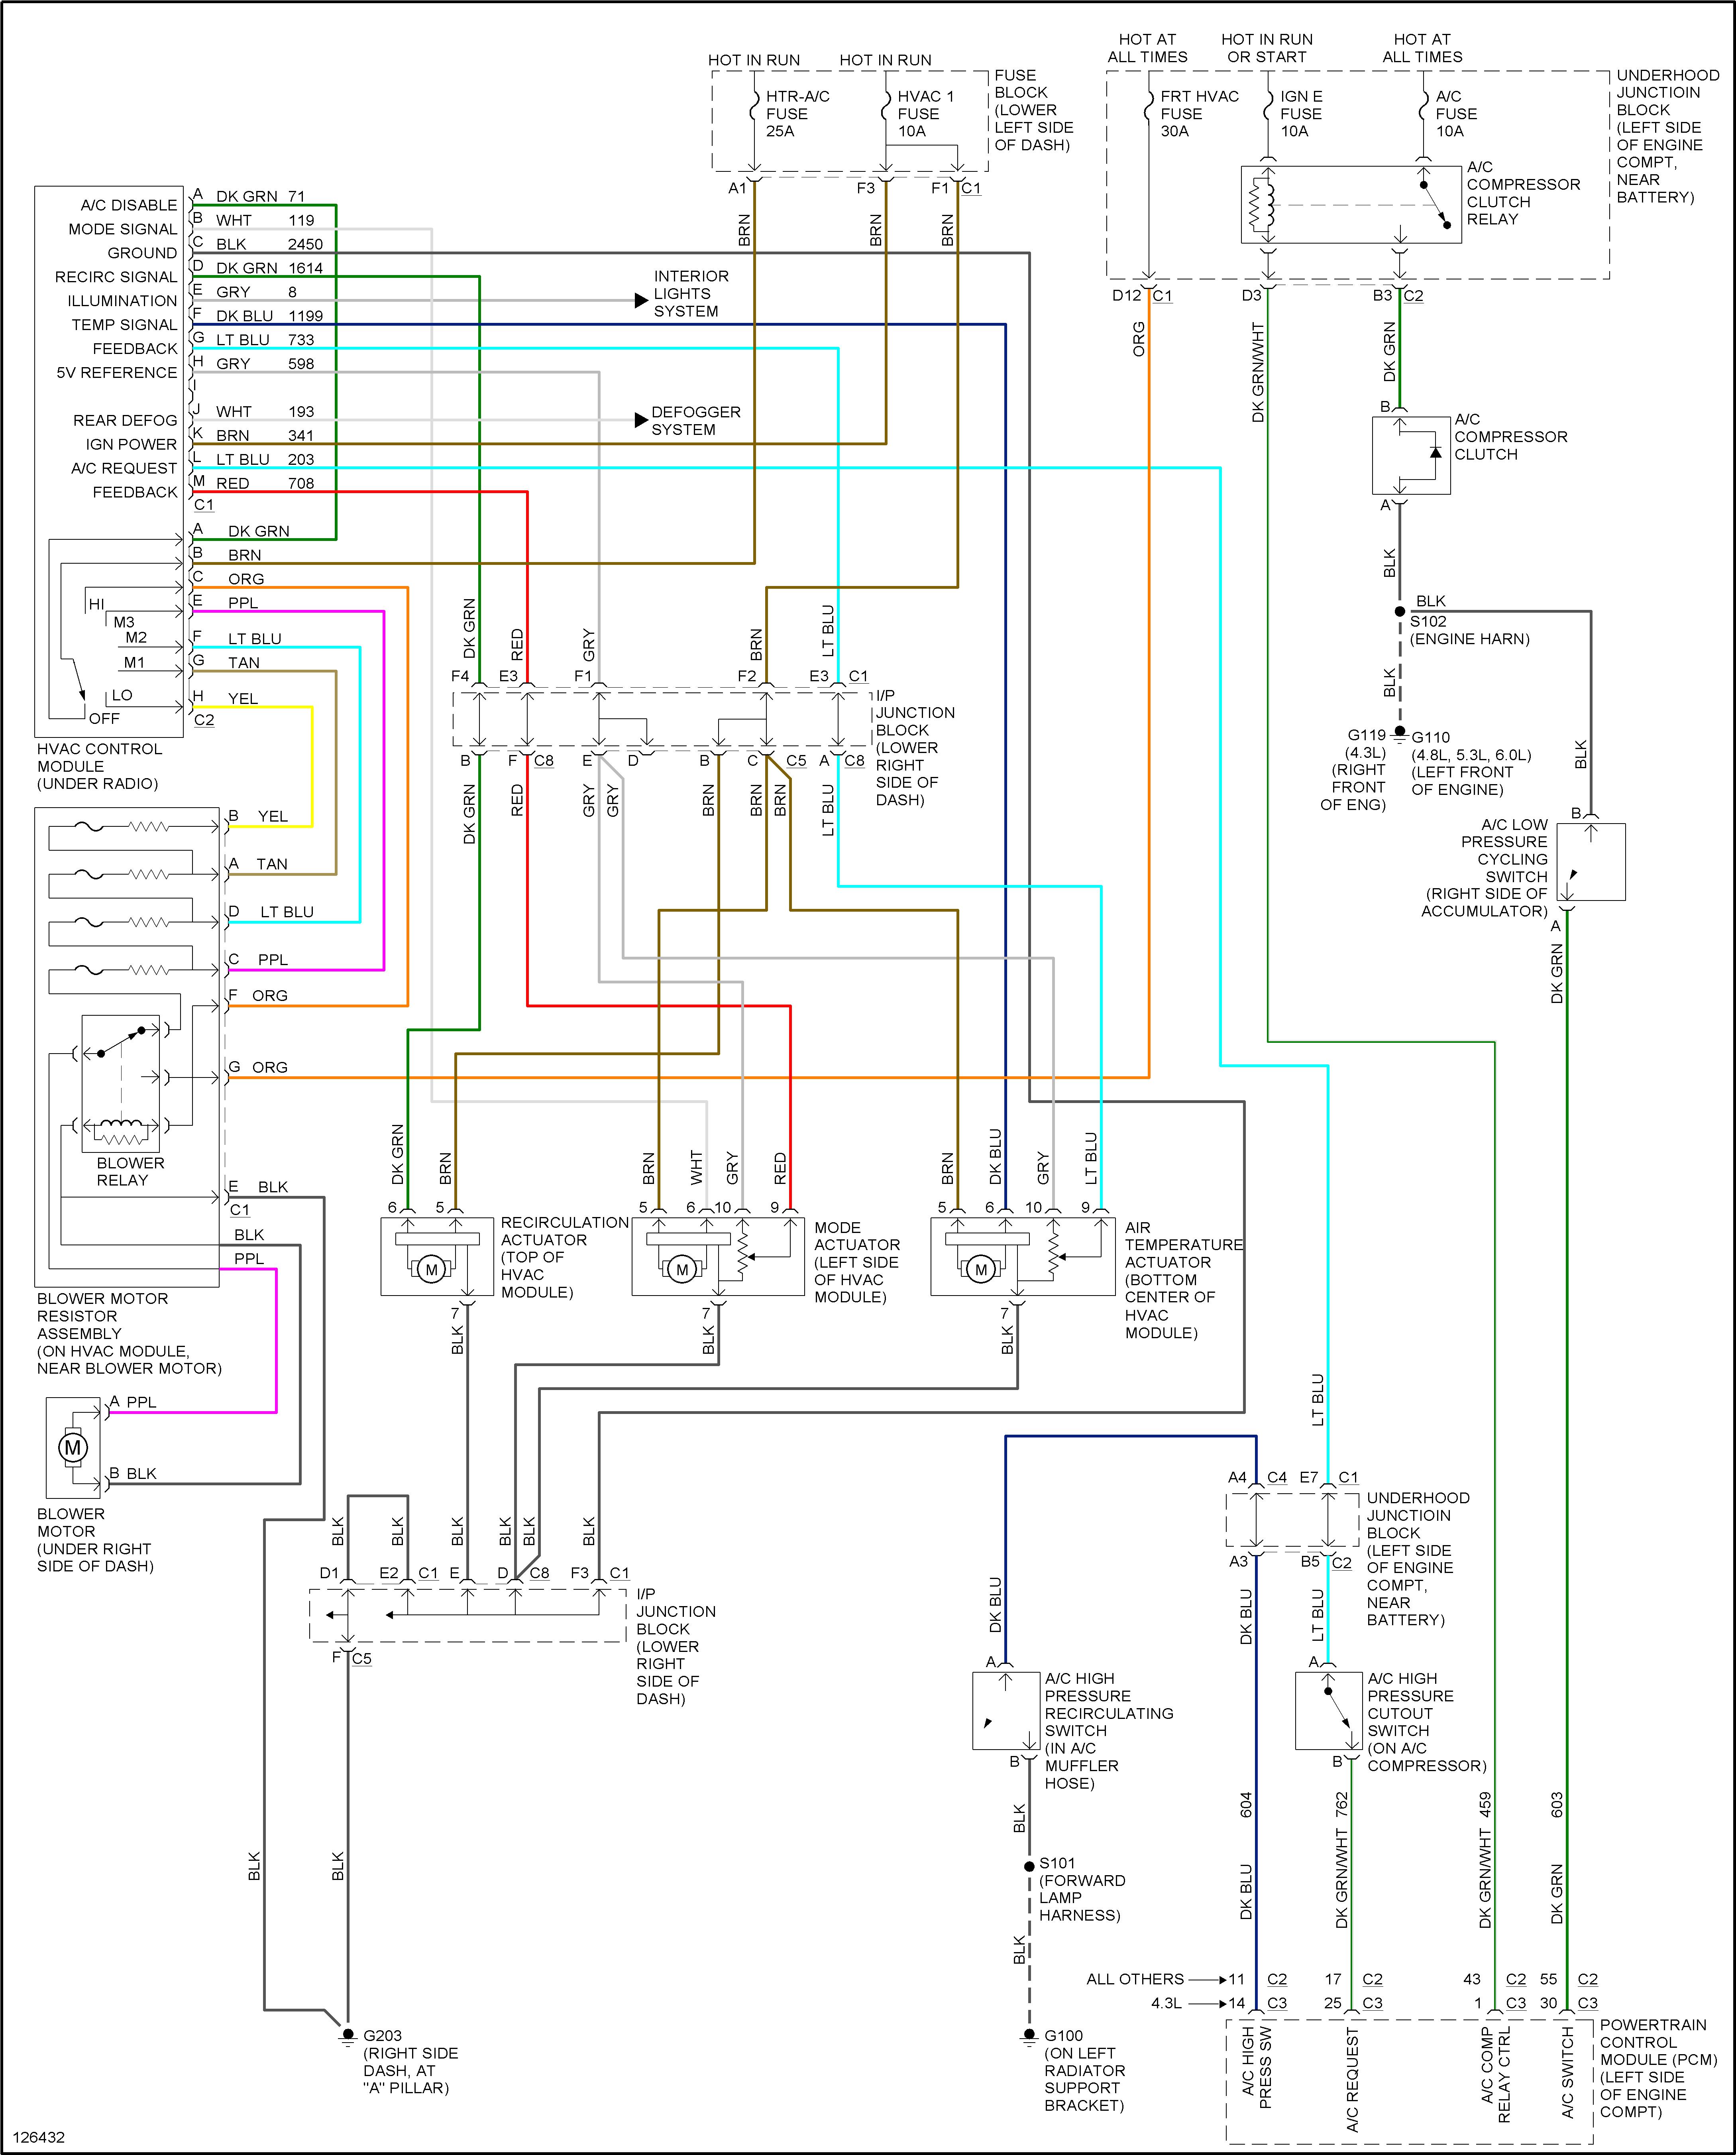 0fc7286e-bede-4844-ac27-b87eb58a8f6c_rear blower controls.png